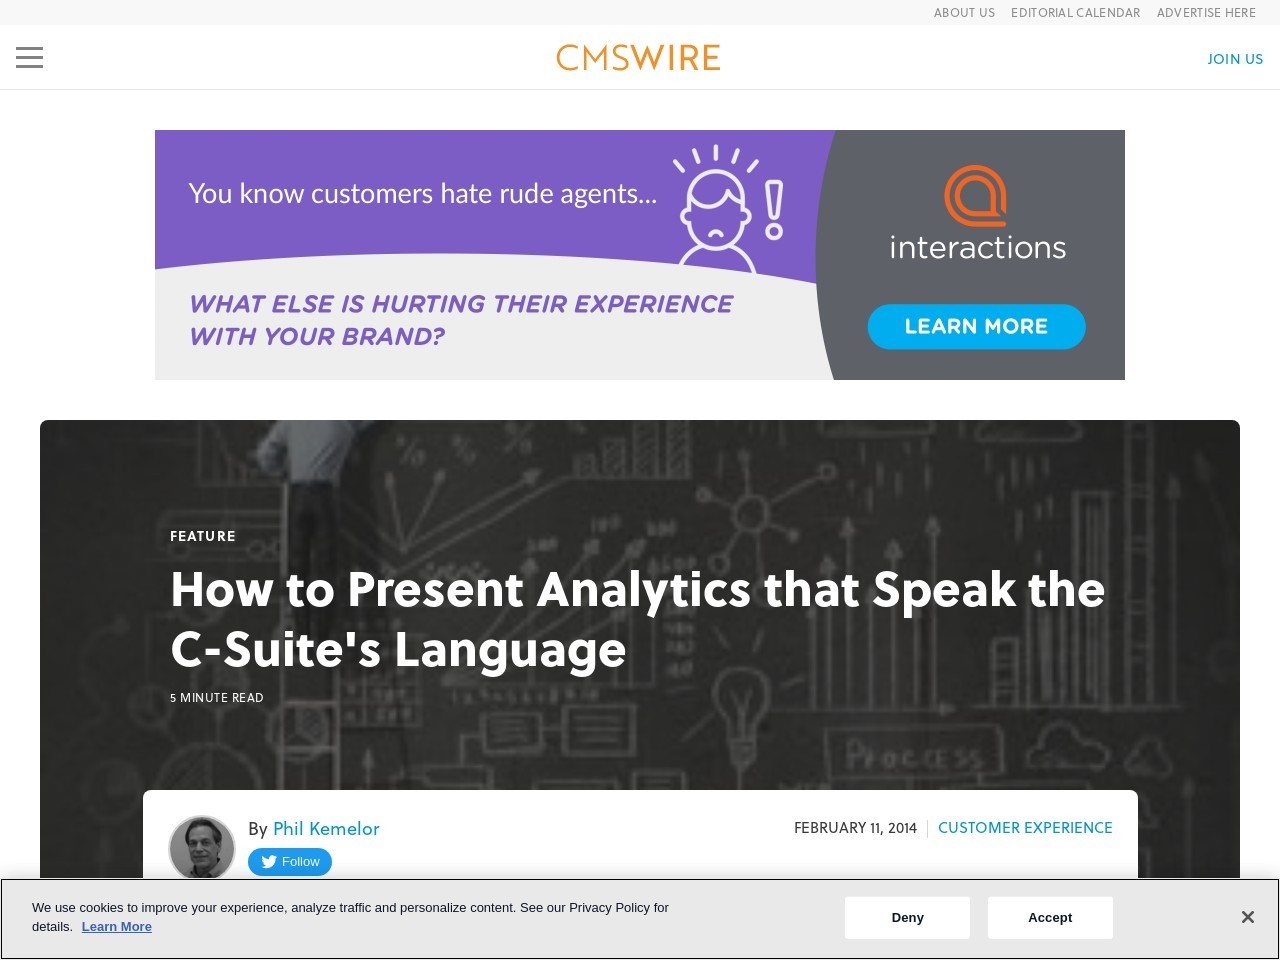 How to Present Analytics that Speak the C-Suite's Language